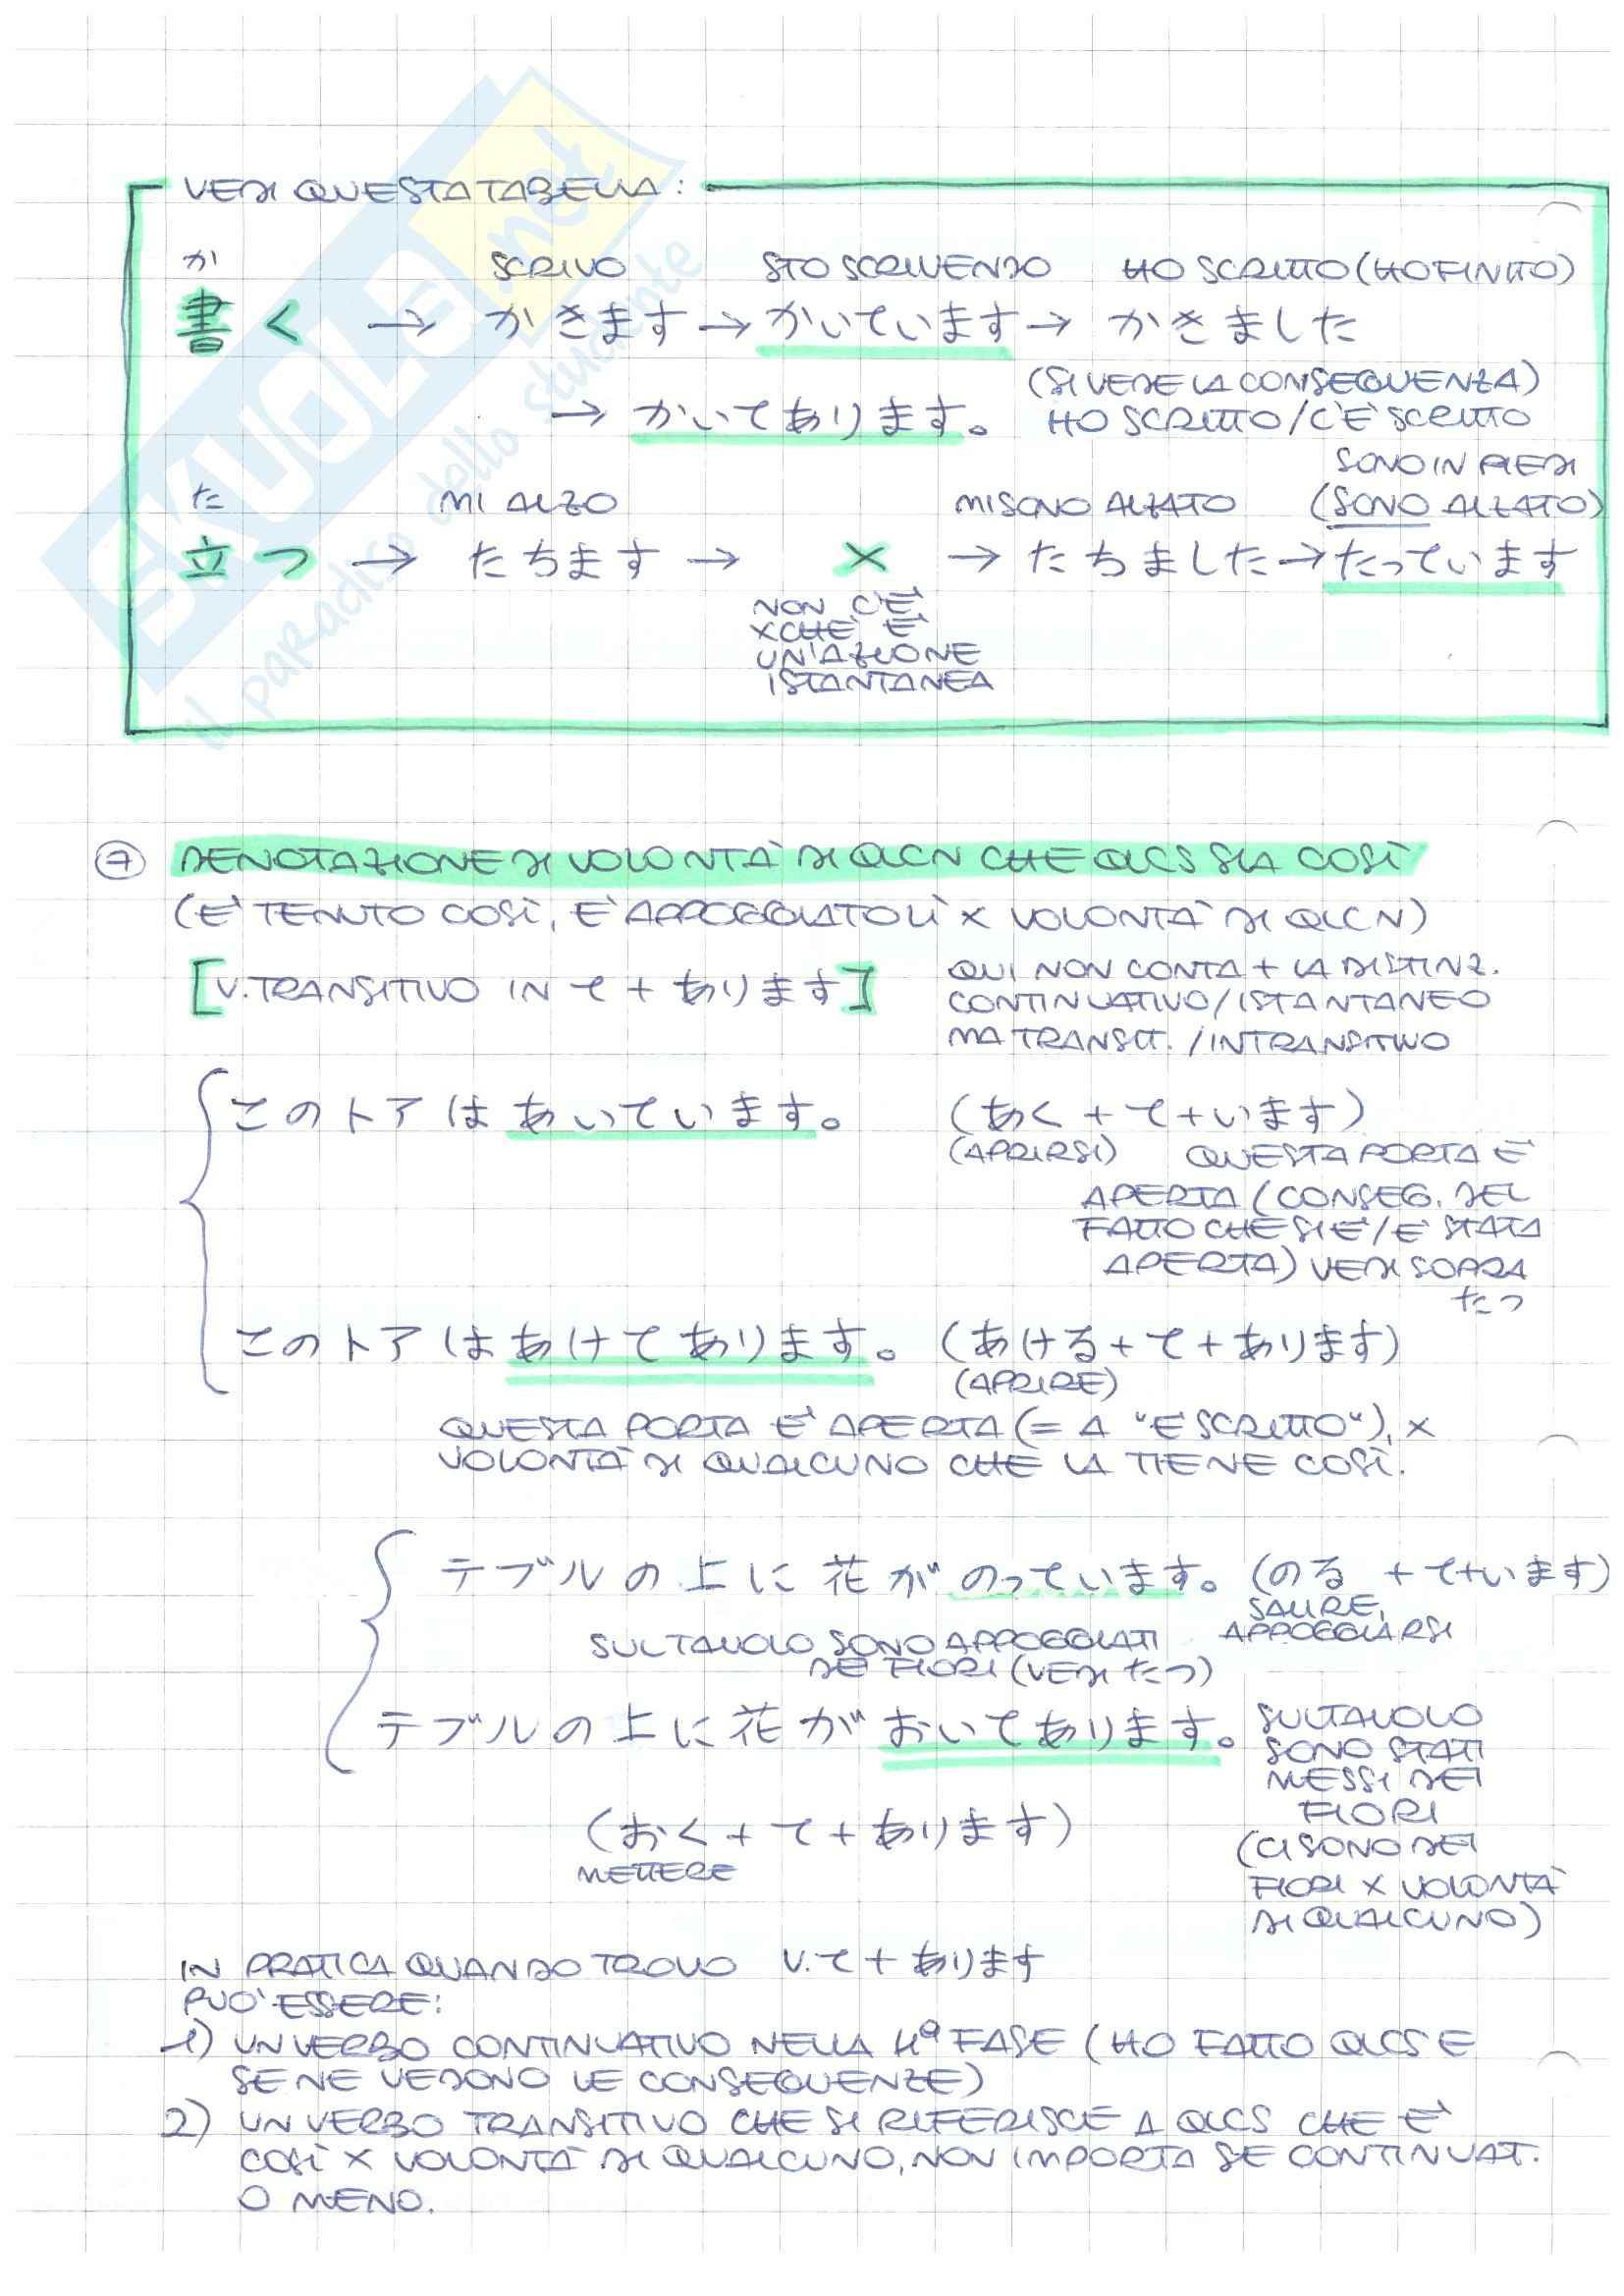 Lingua giapponese 1 - la grammatica giapponese Pag. 6